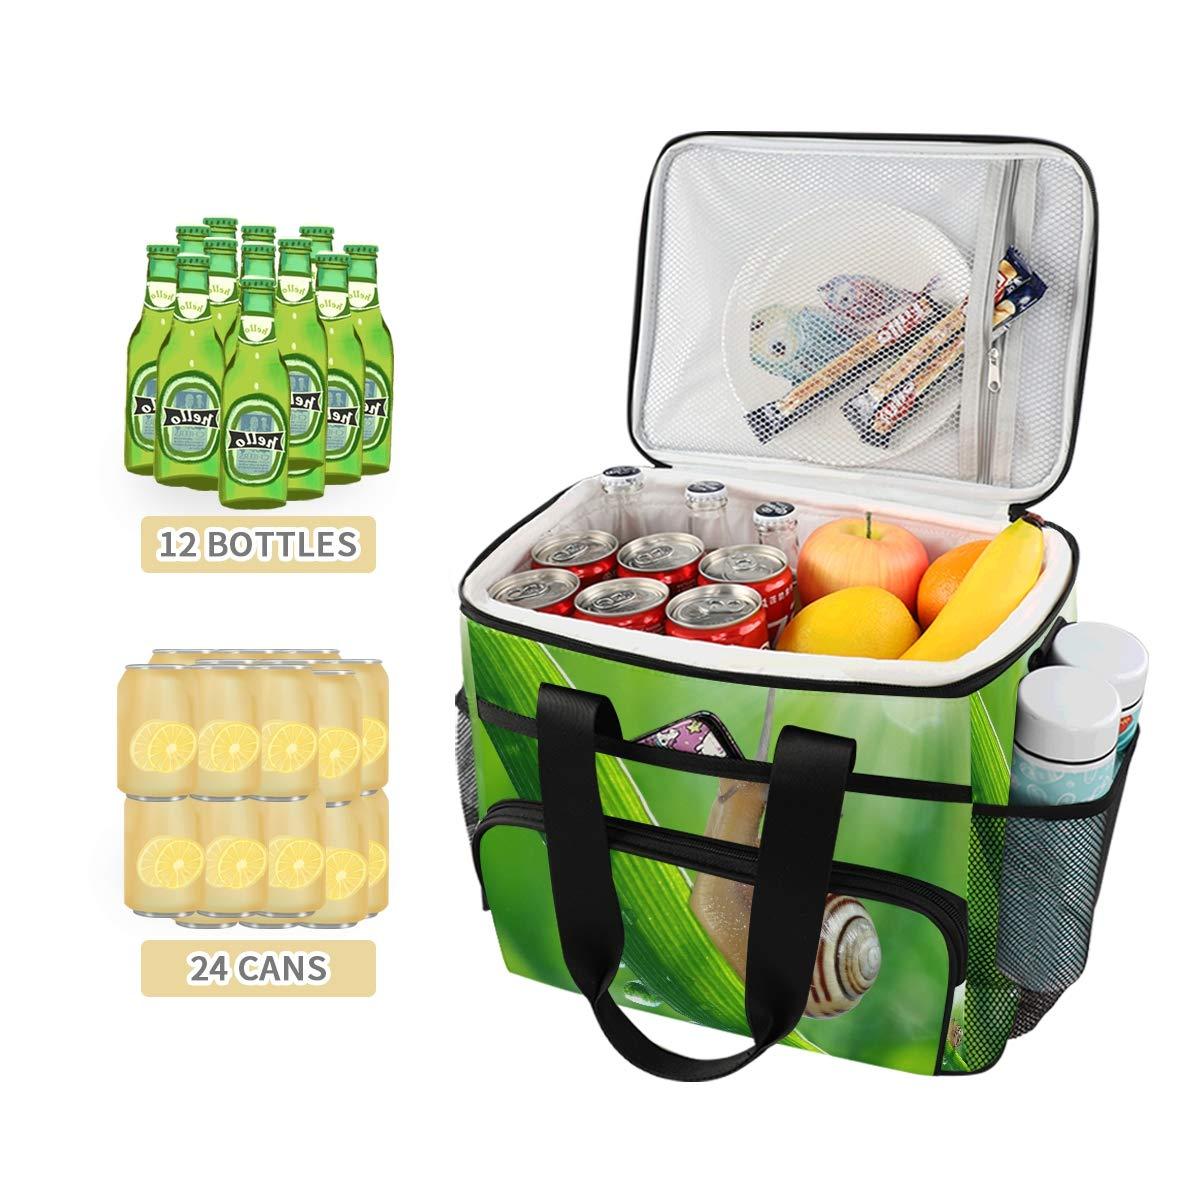 Picnic Cooler Box Snail On Dewy Grass Ice Pack Portable Work Lunch Bag Correa para el hombro: Amazon.es: Hogar